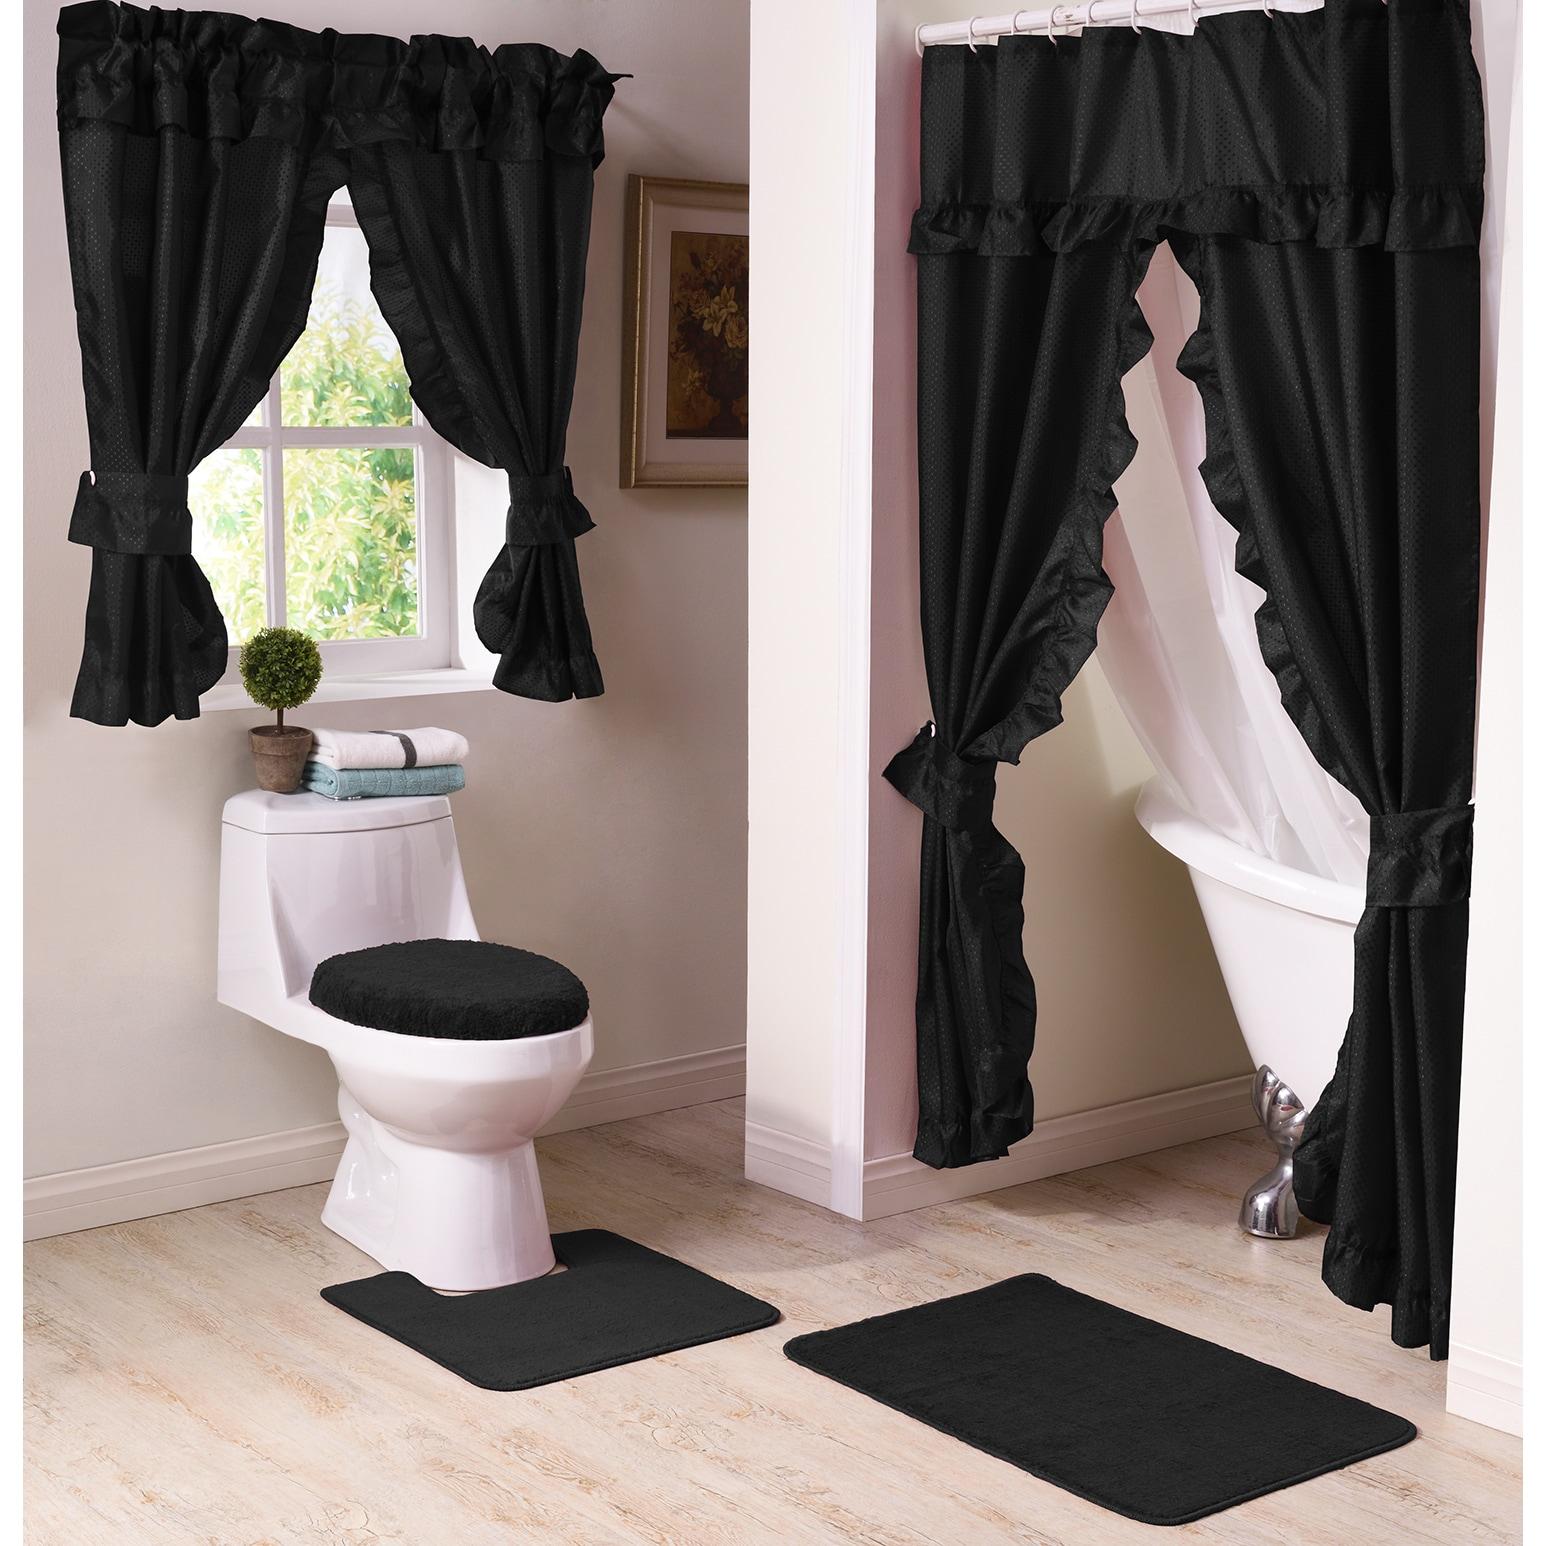 Madison Starlite 11-Piece Shower Curtain and Window Curta...